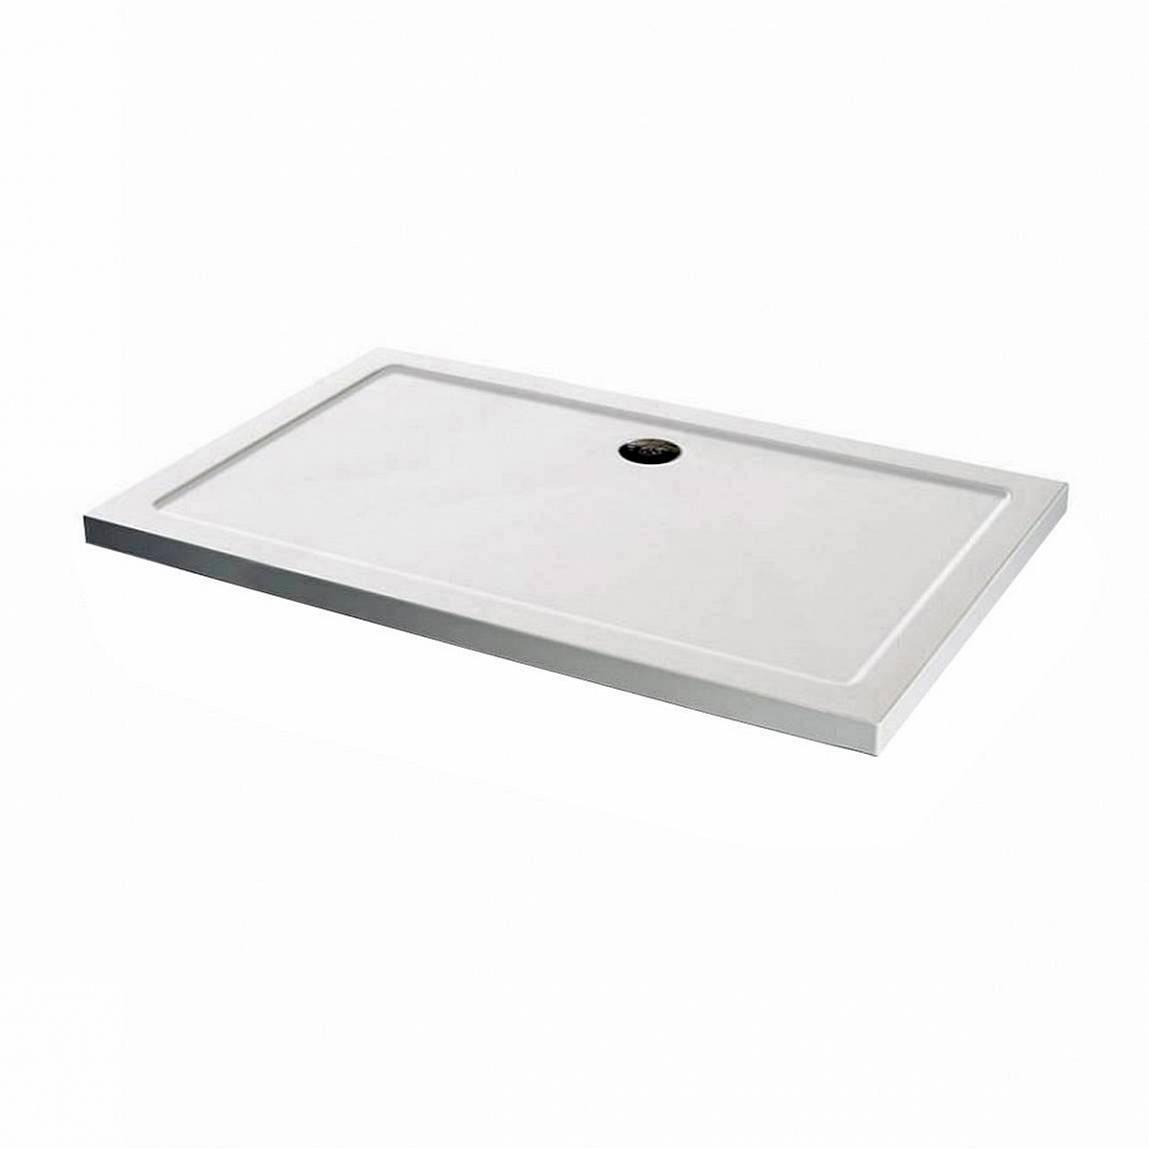 Image of Rectangular Stone Shower Tray 1200 x 760